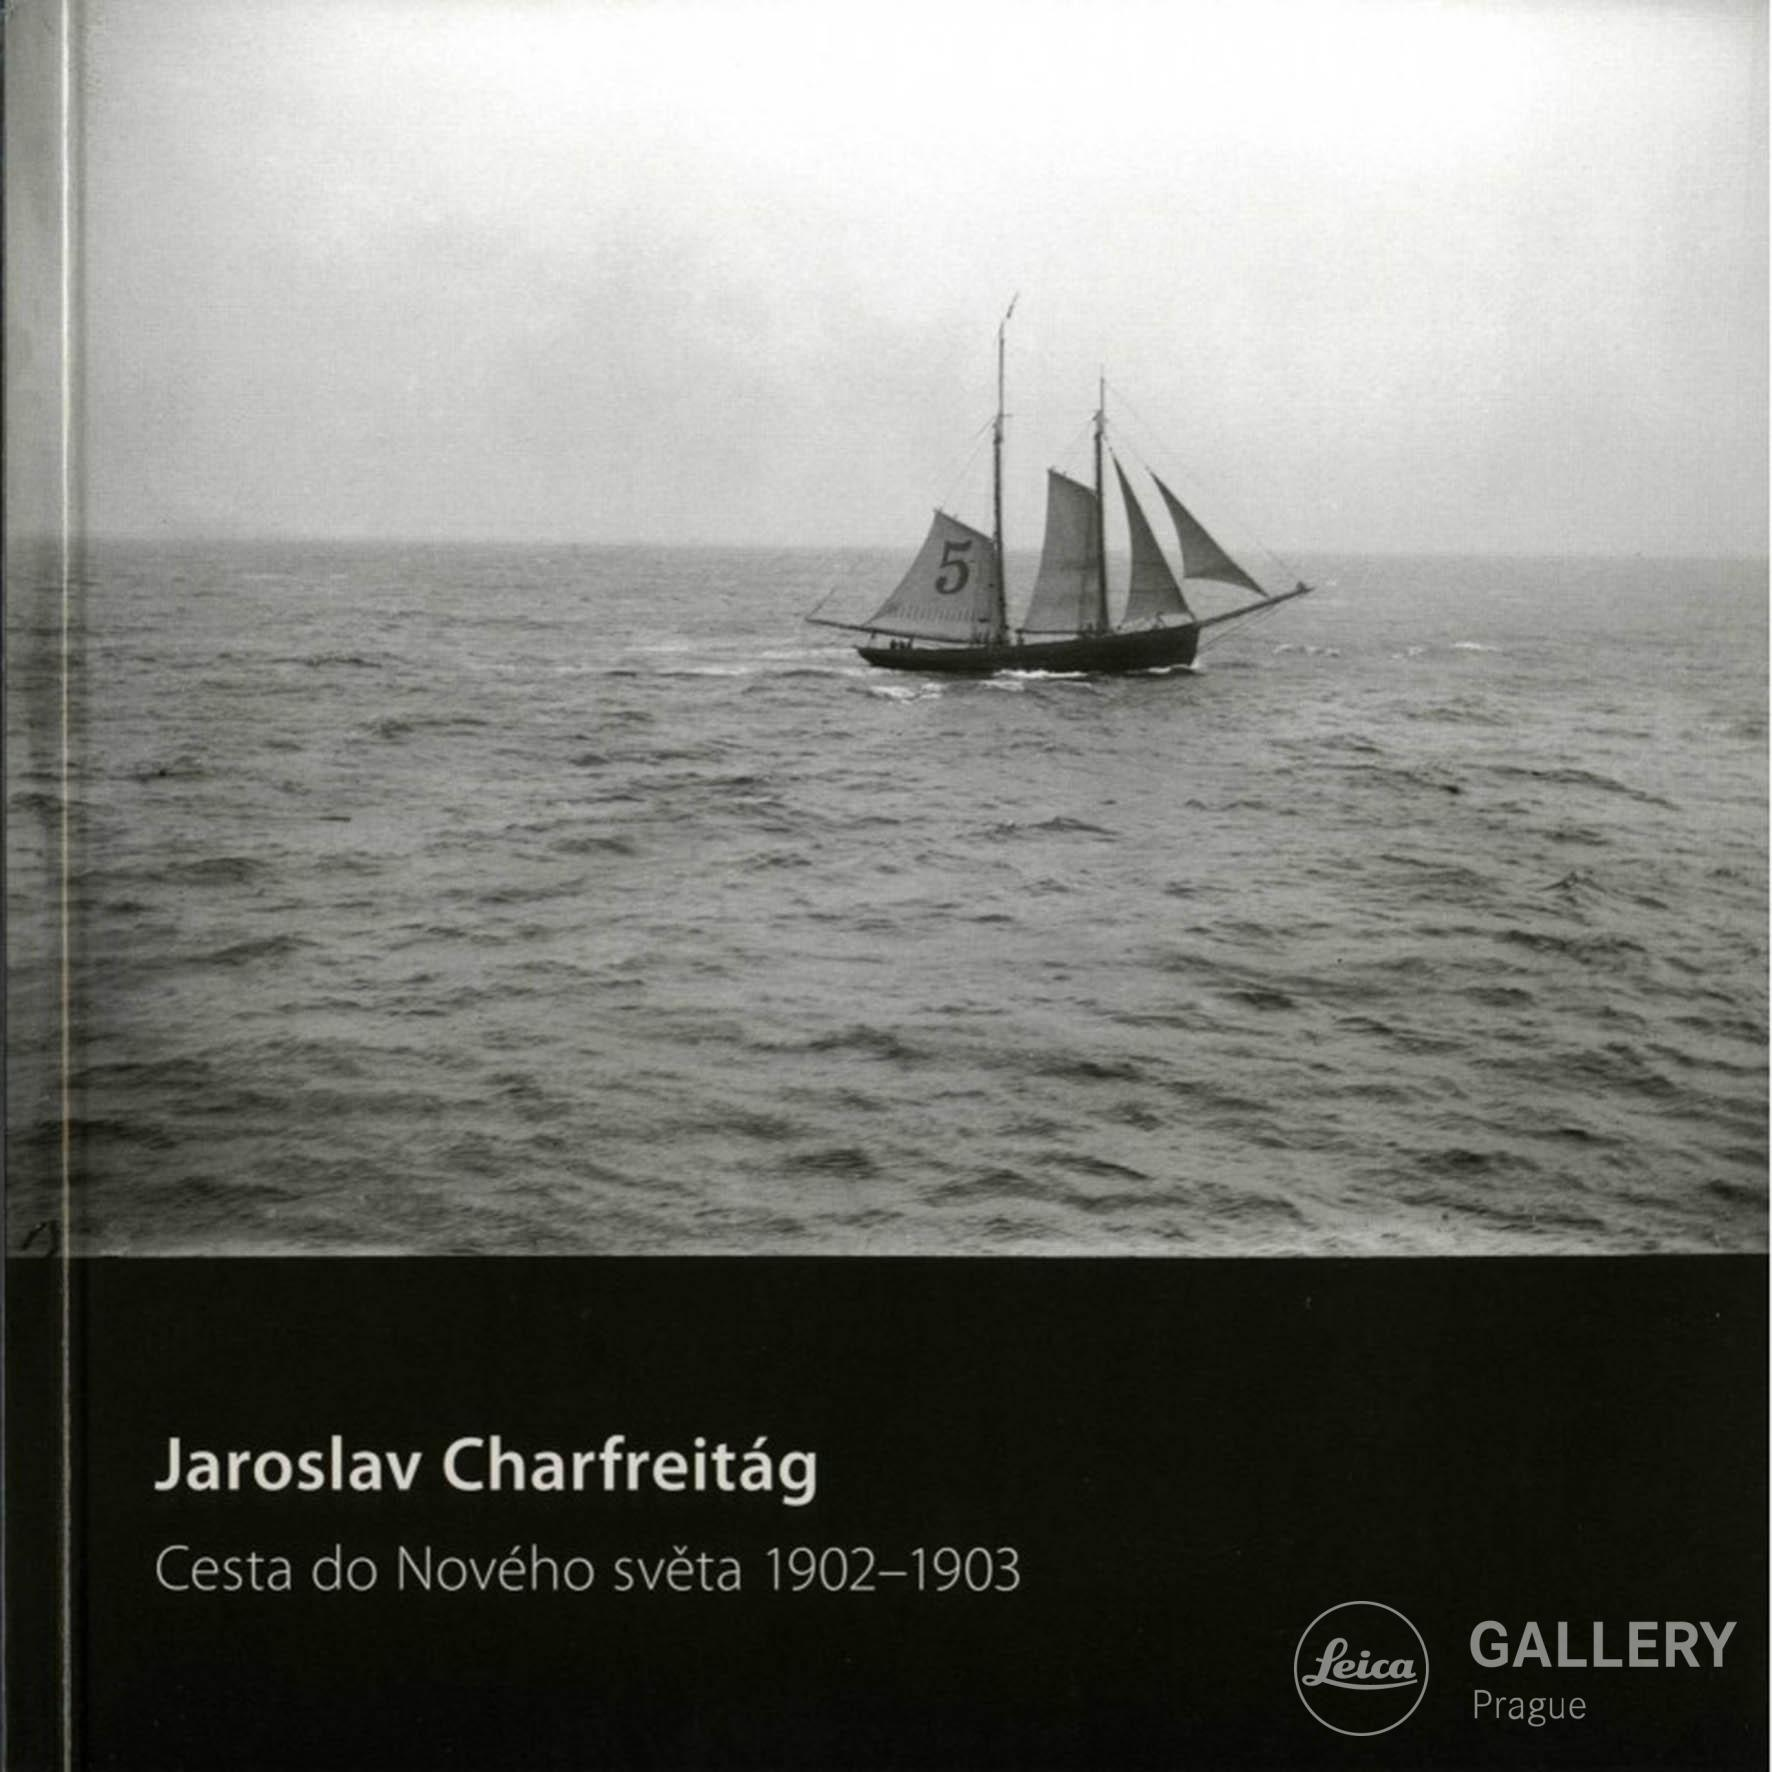 JAROSLAV CHARFREITÁG, PAVEL SIOSTRZONEK